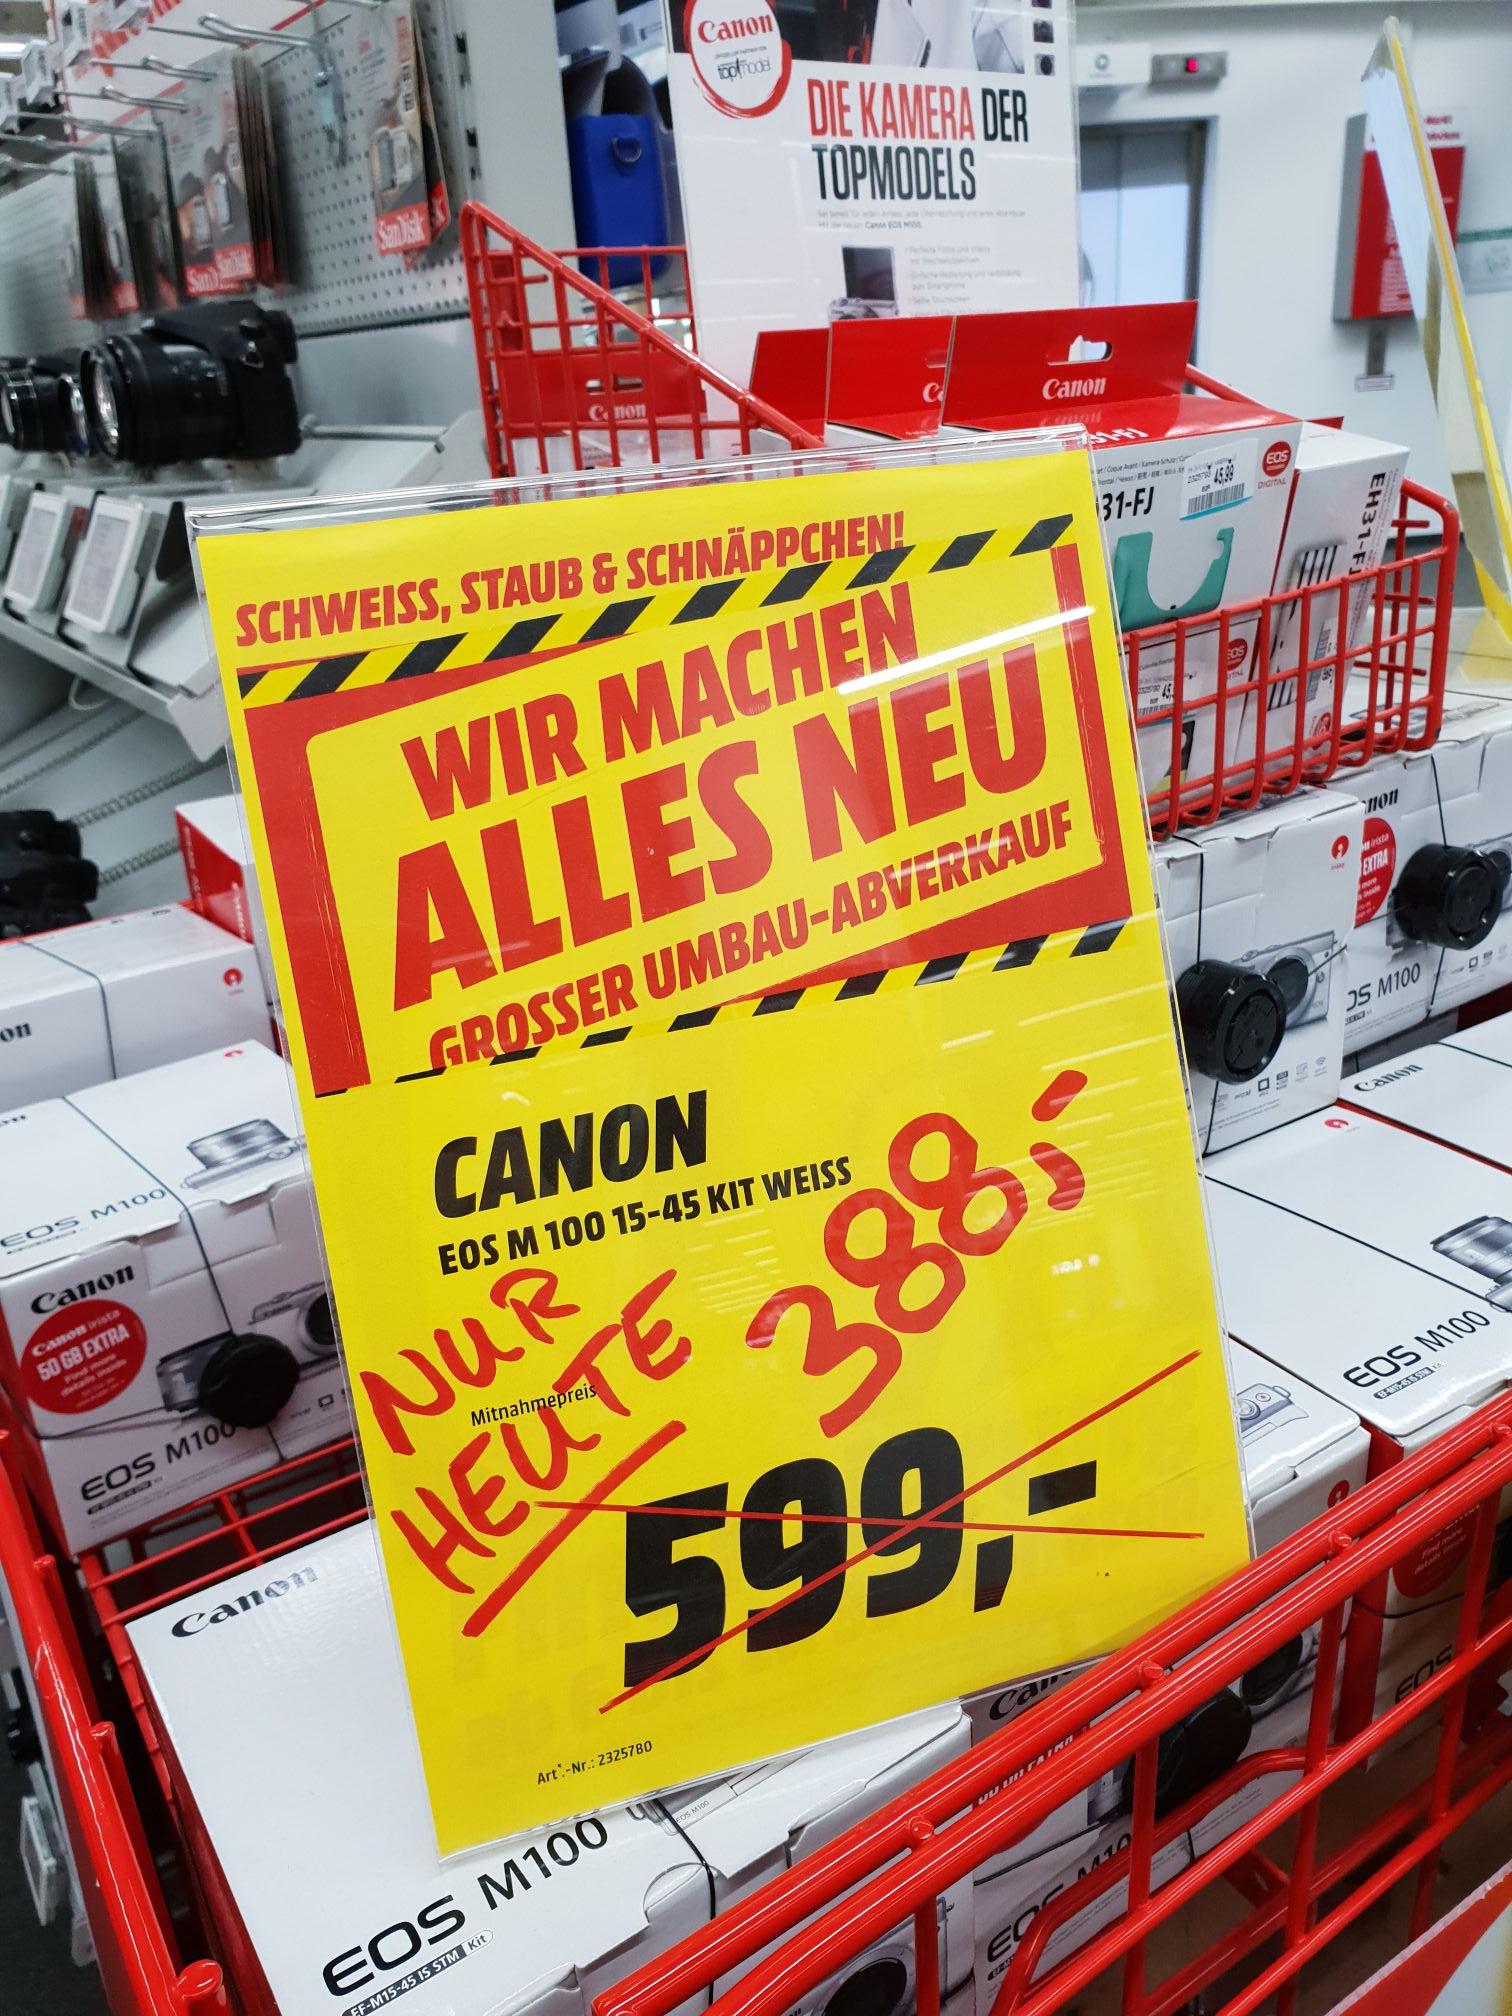 Lokal canon eos m100 15-45 media markt München Haidhausen